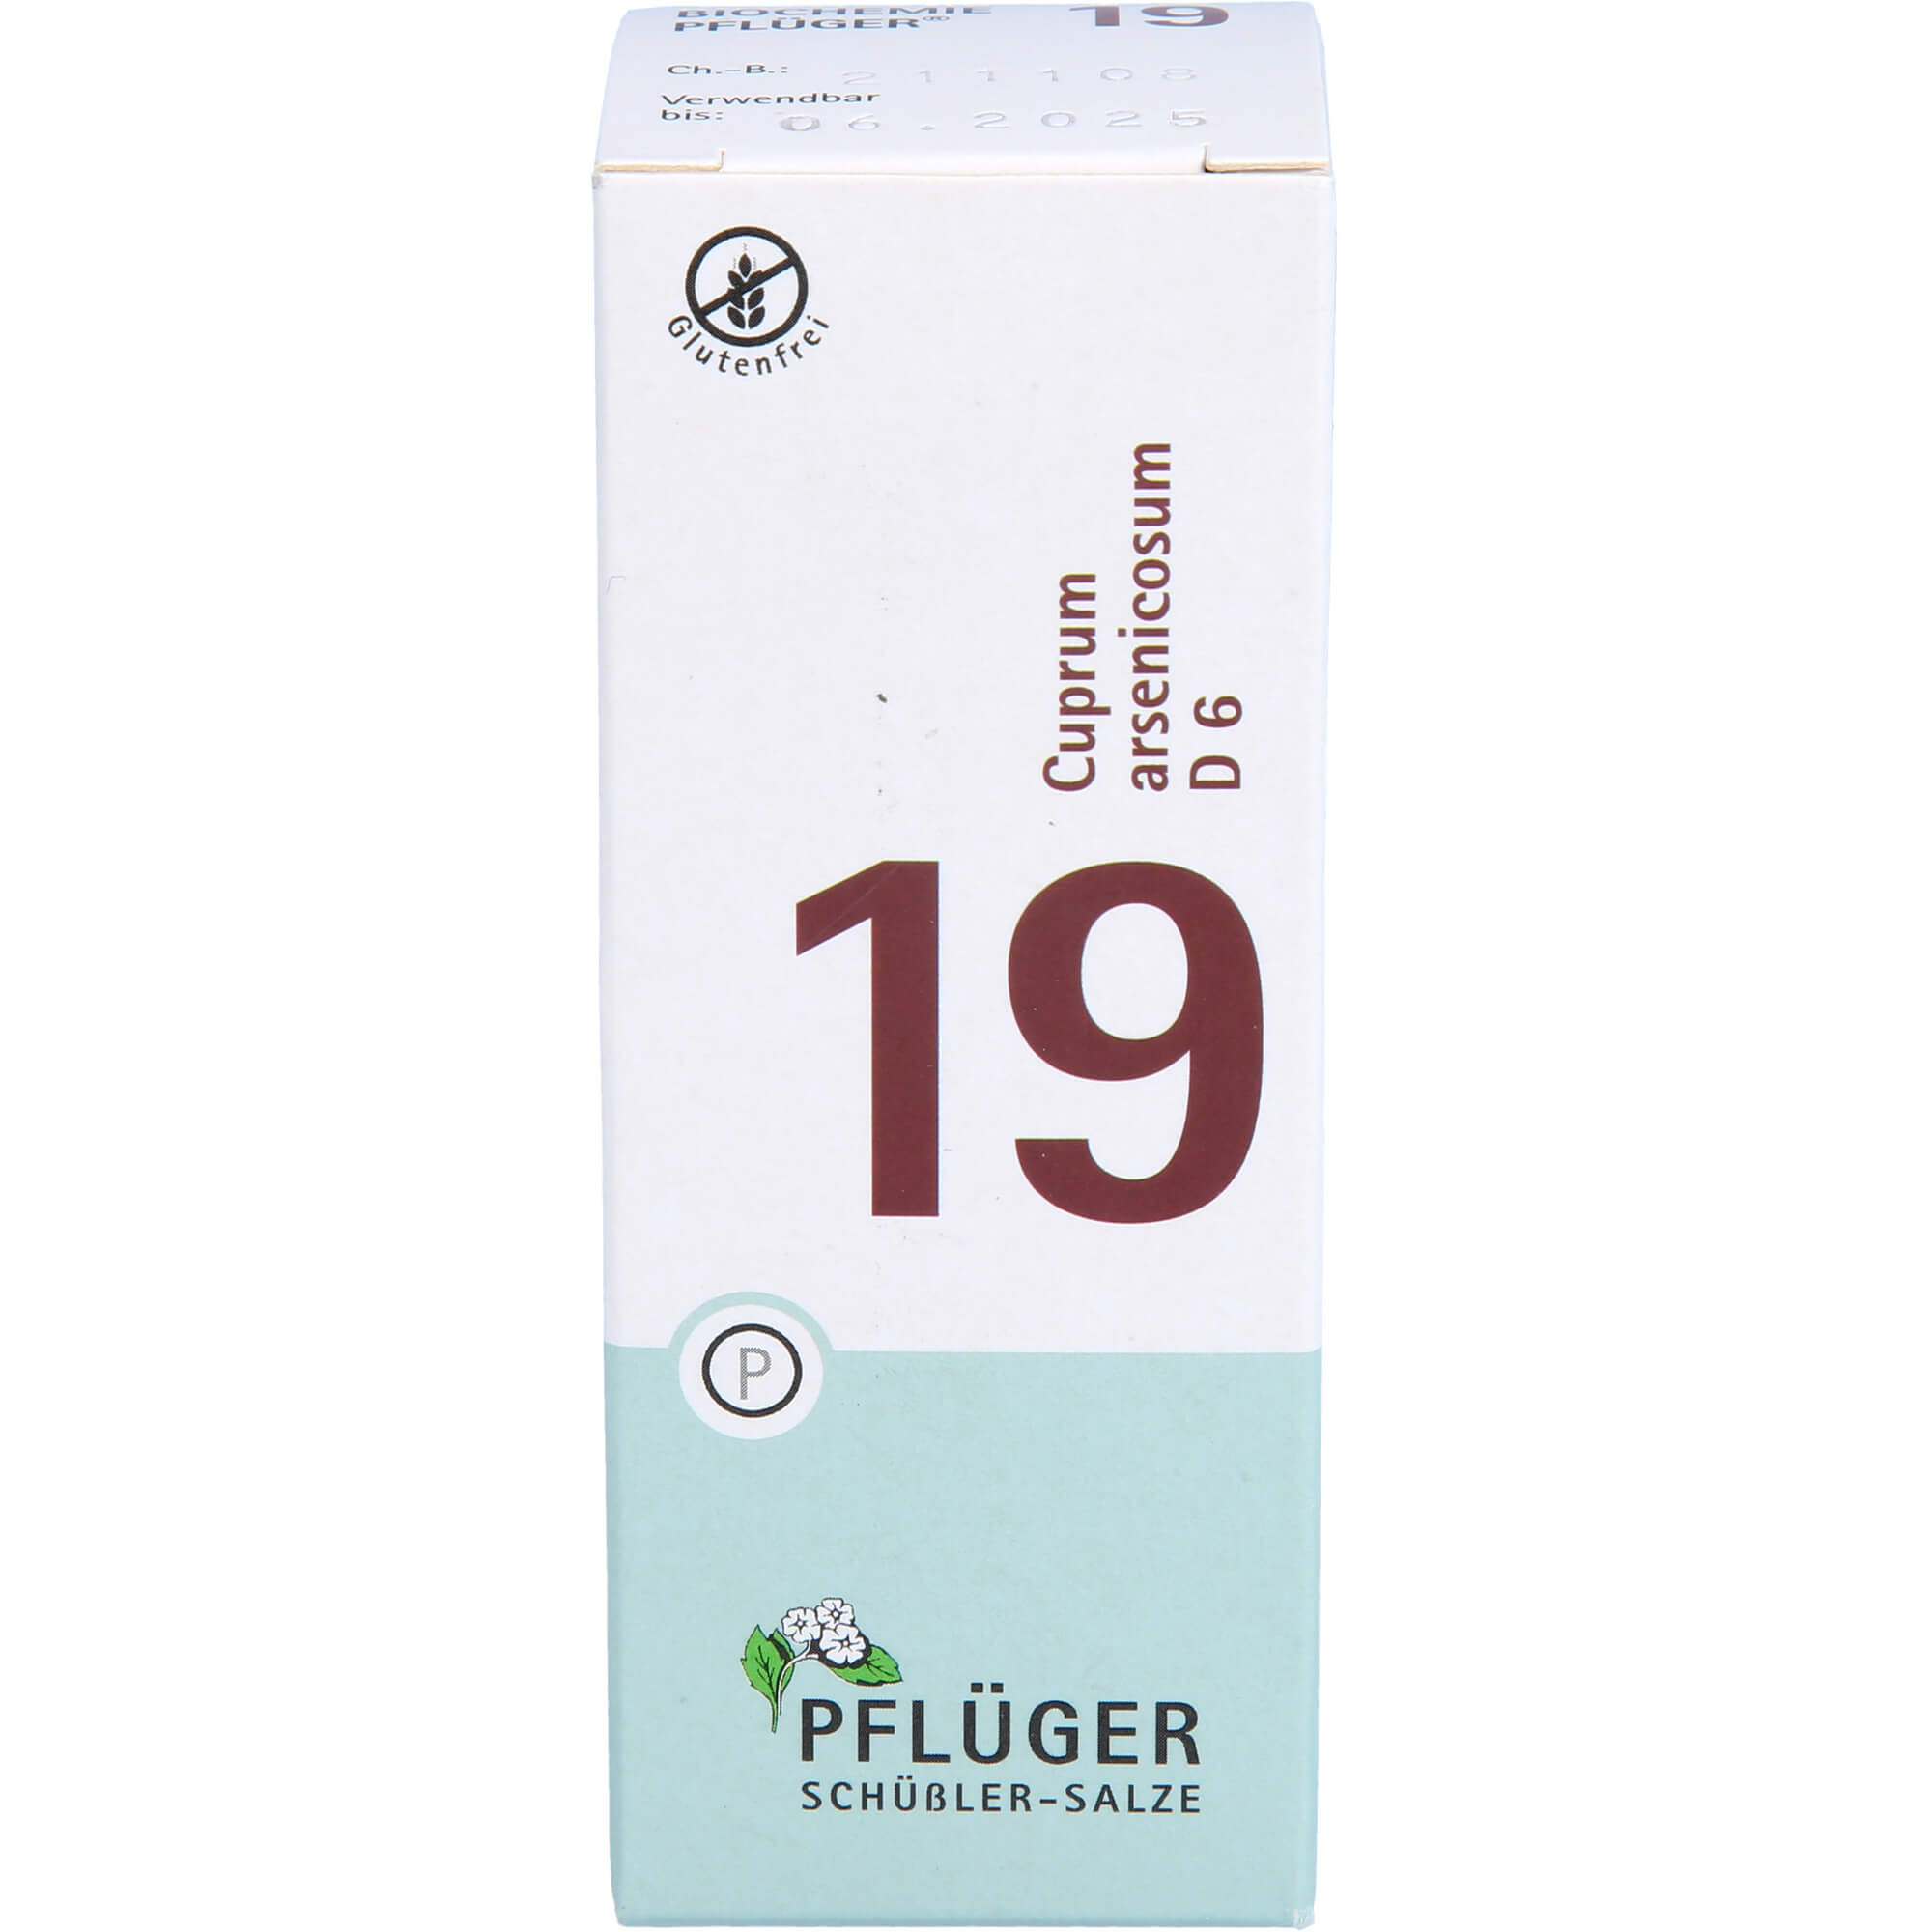 BIOCHEMIE Pflüger 19 Cuprum arsenicosum D 6 Tabl.